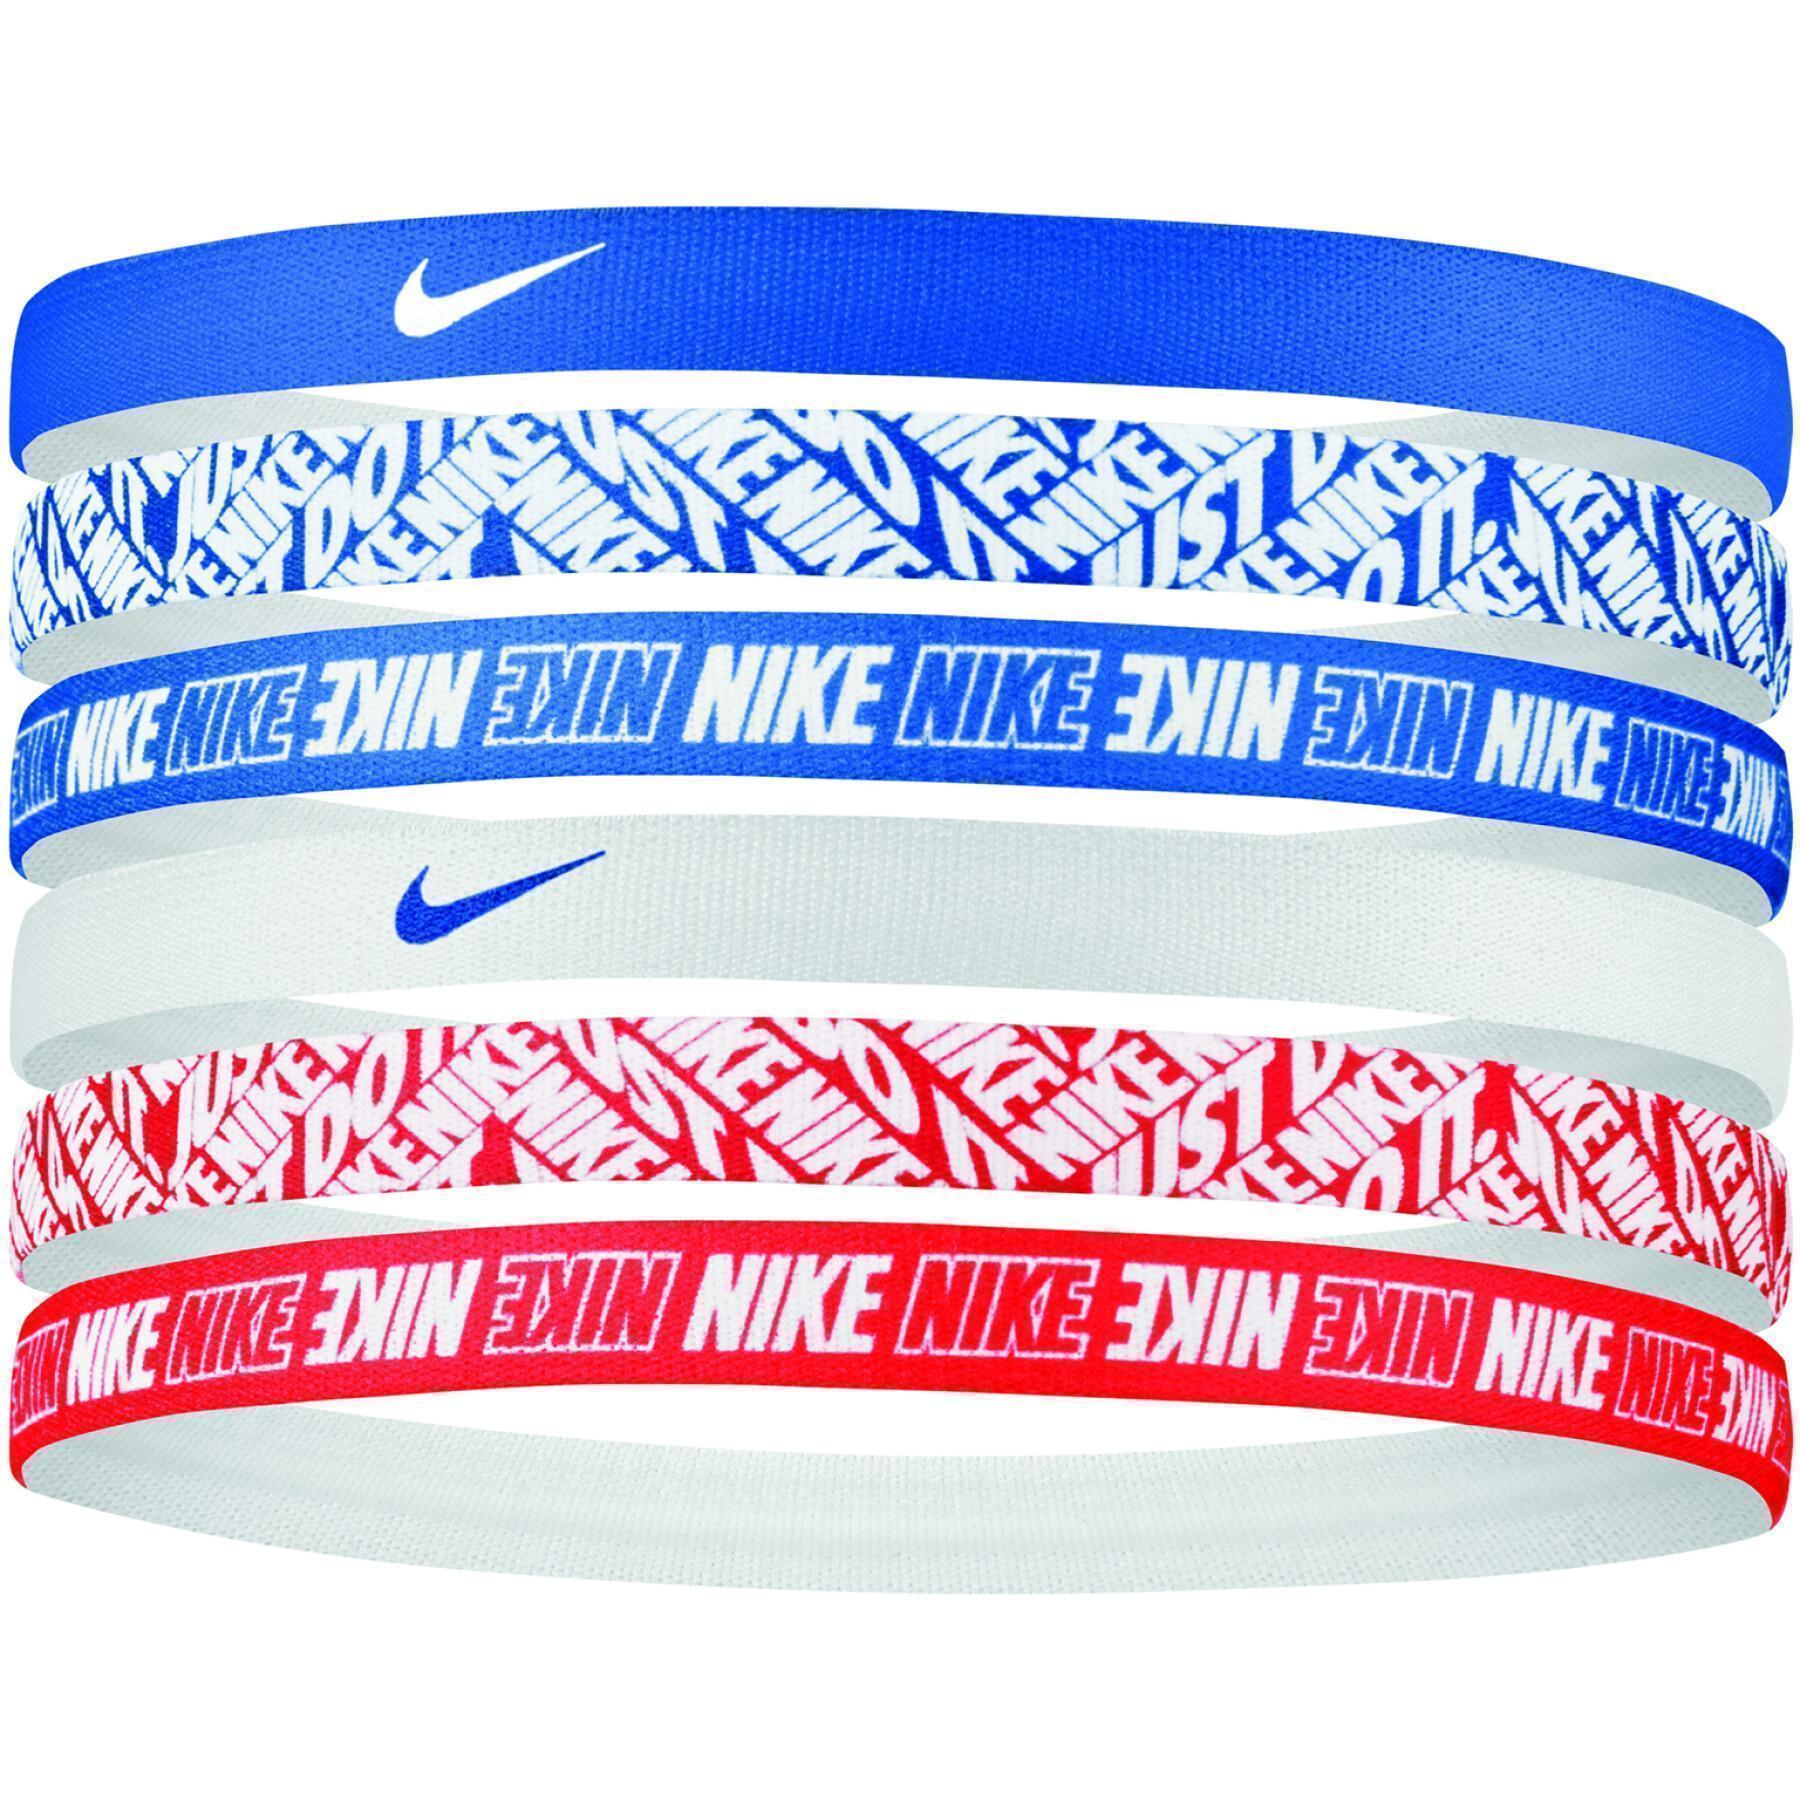 Set of 6 headbands Nike